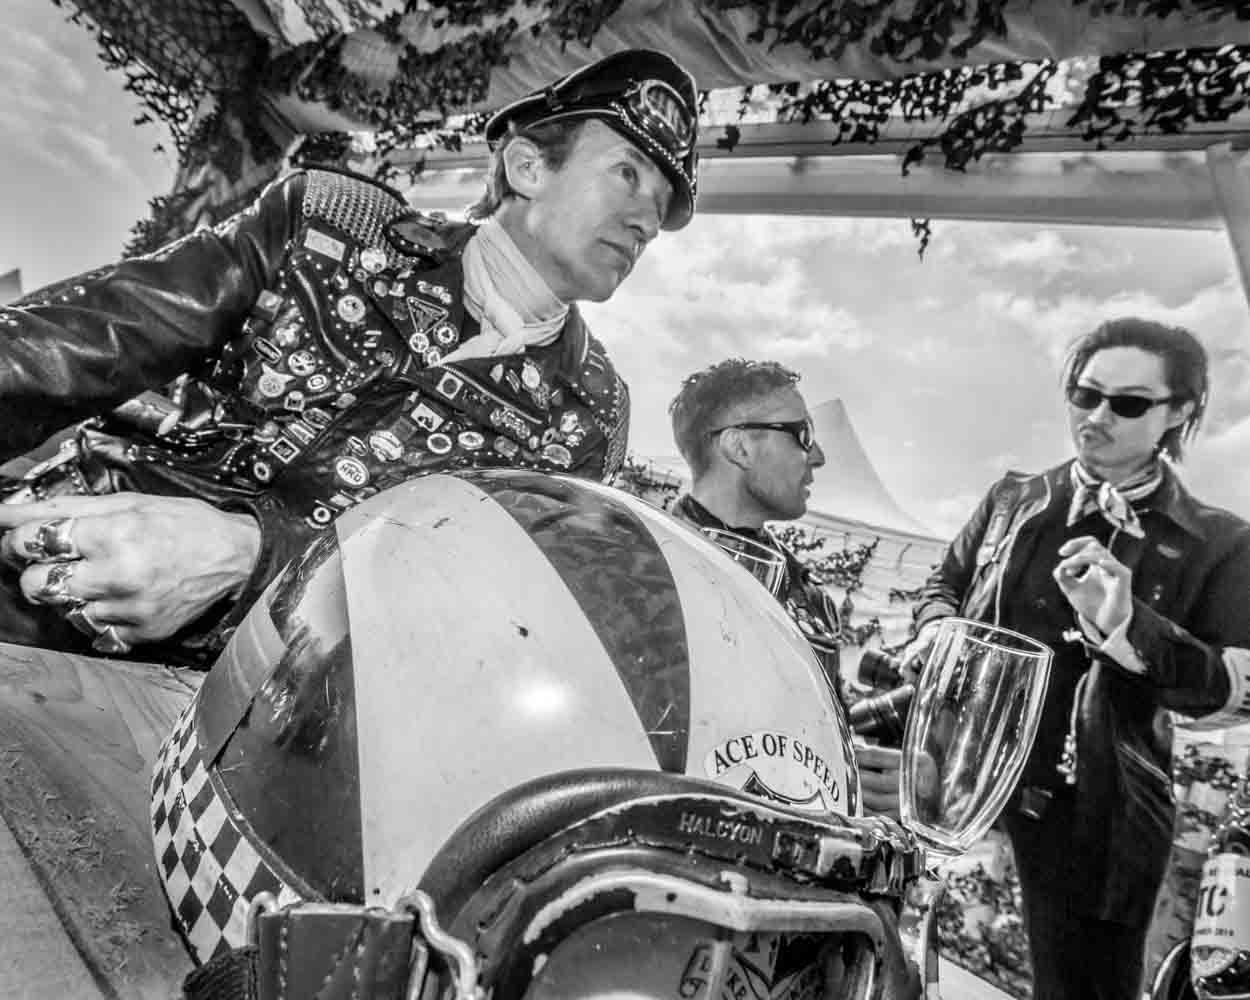 Bikers Goodwood Revival 2014